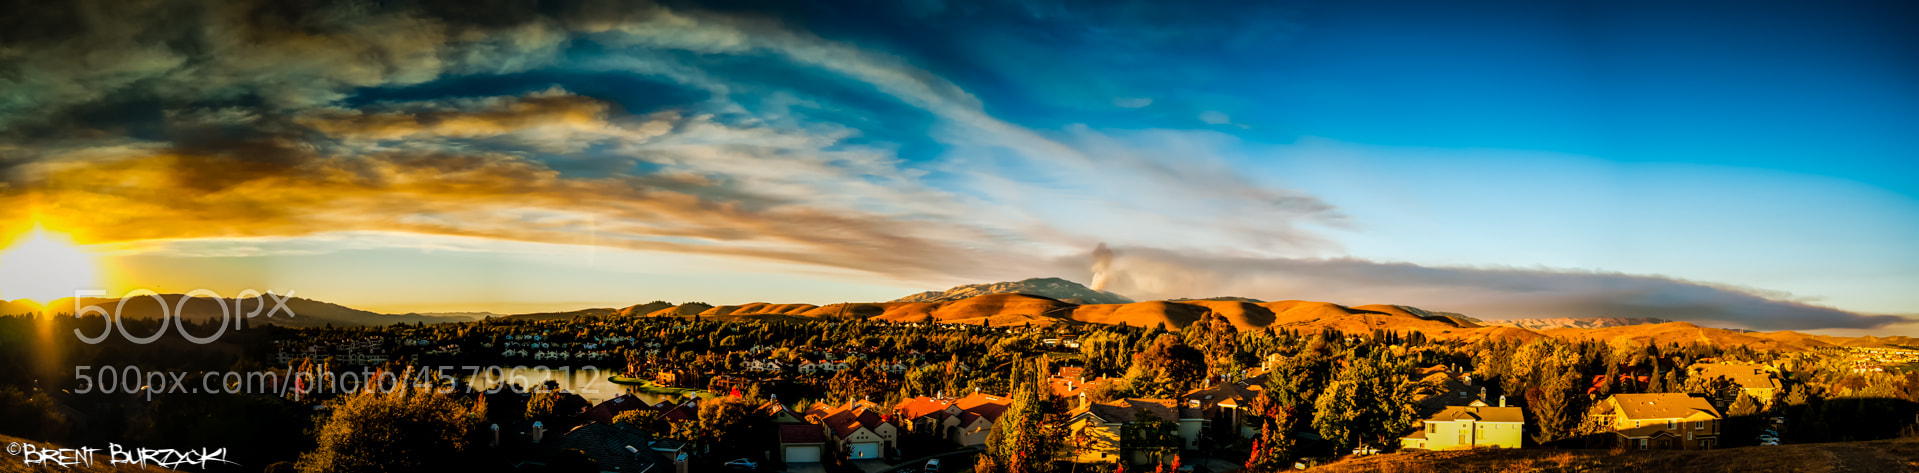 Photograph Mount Diablo Wildfire Pano by Brent Burzycki on 500px